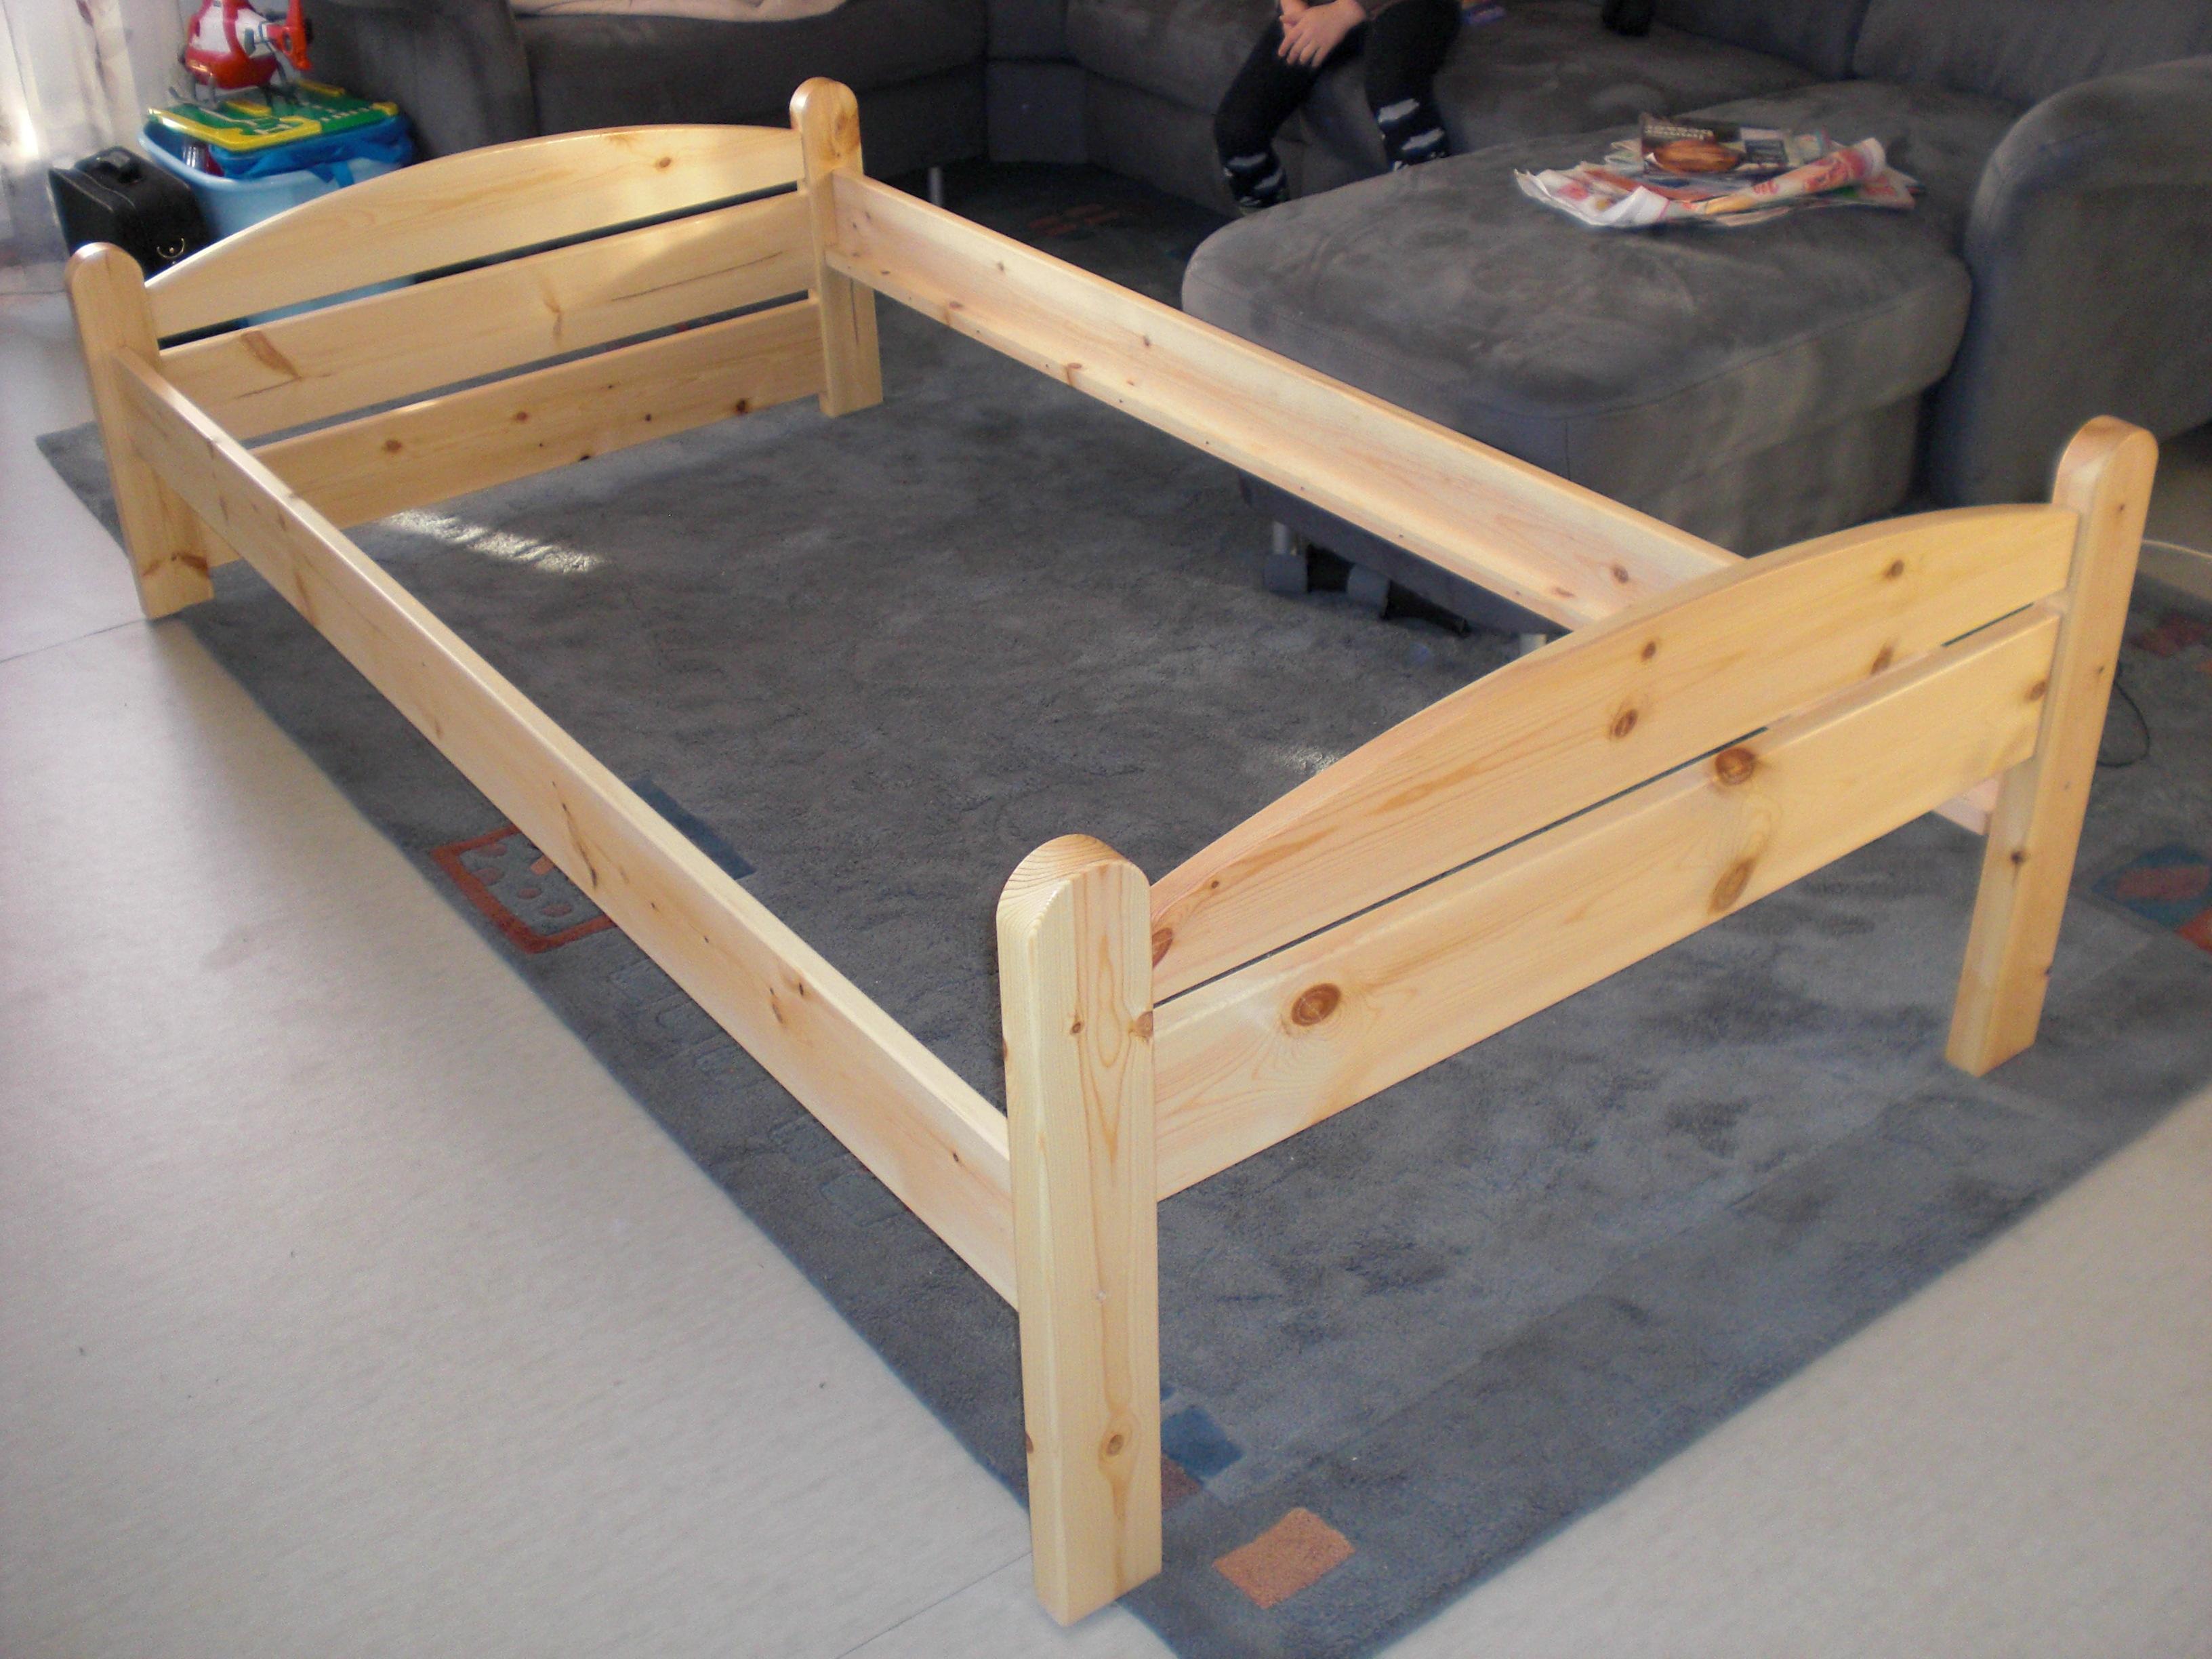 jugendbett mit schubladen und lattenrost in berlin m bel. Black Bedroom Furniture Sets. Home Design Ideas